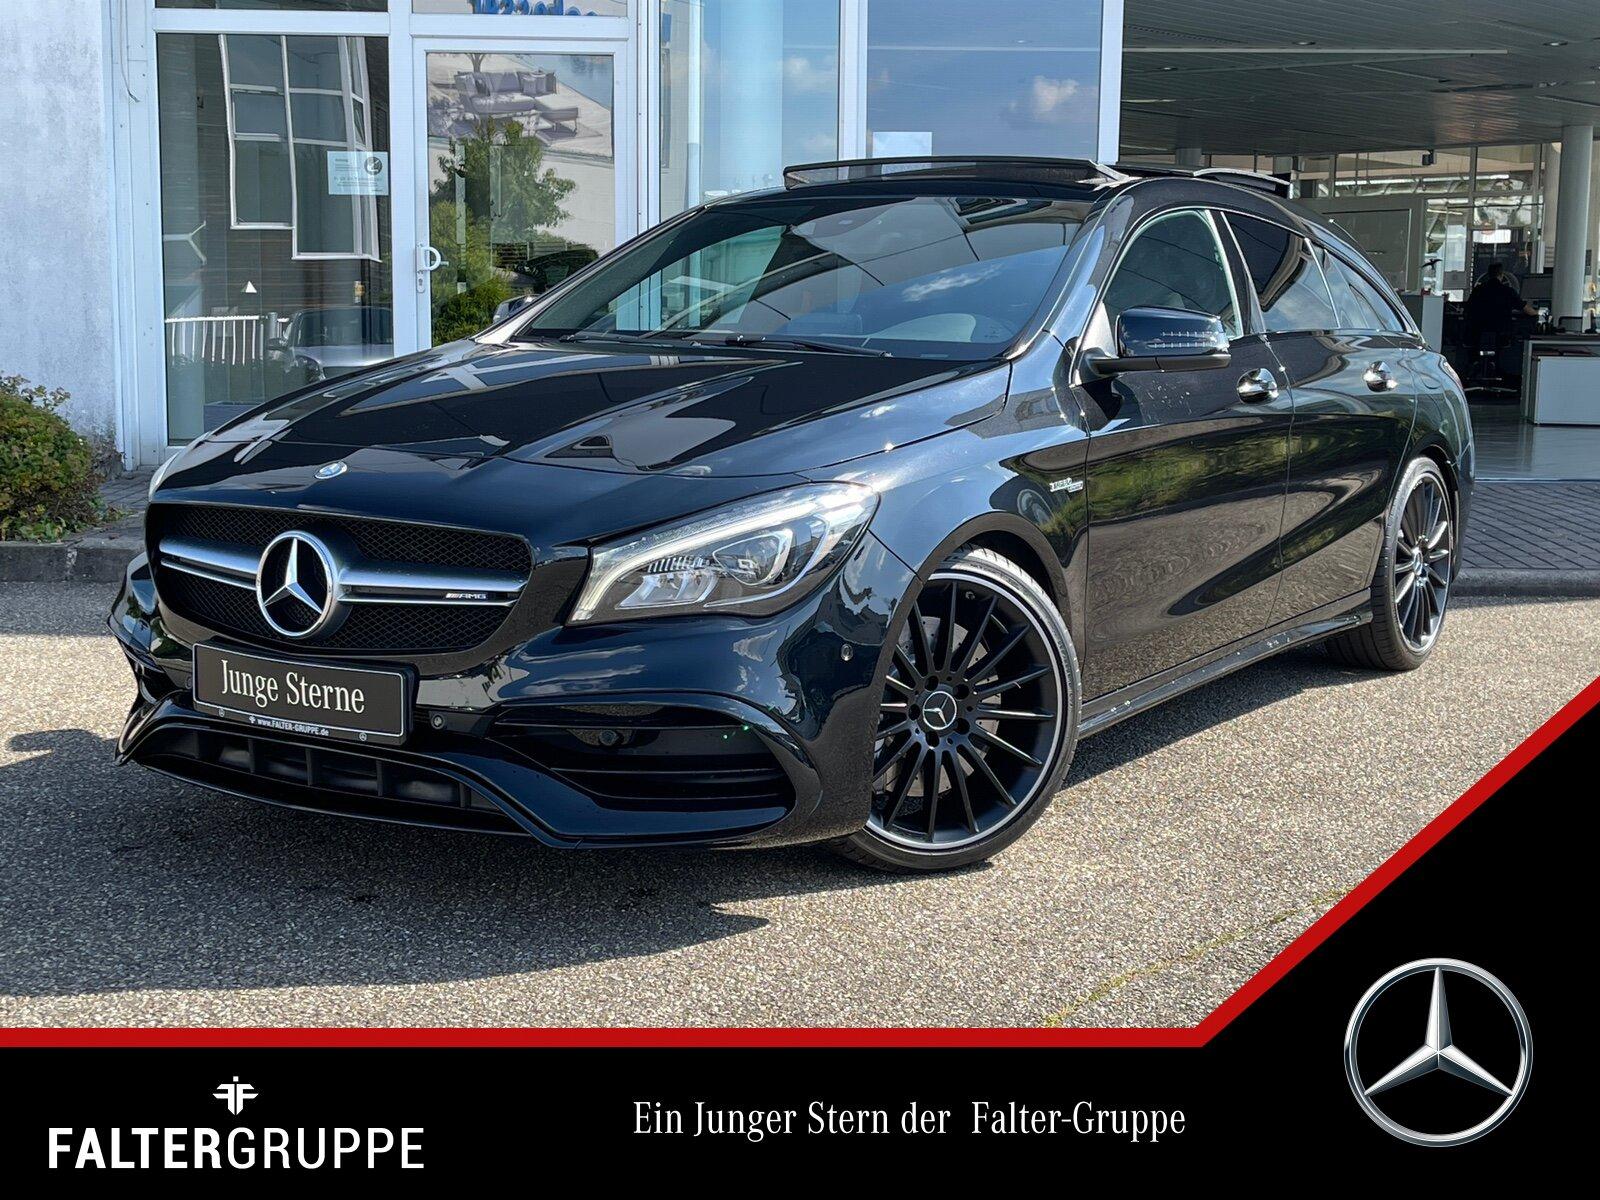 "Mercedes-Benz CLA 45 4M SB PANO+COMAND+NIGHT+EASYPACK+LED+19"", Jahr 2017, petrol"